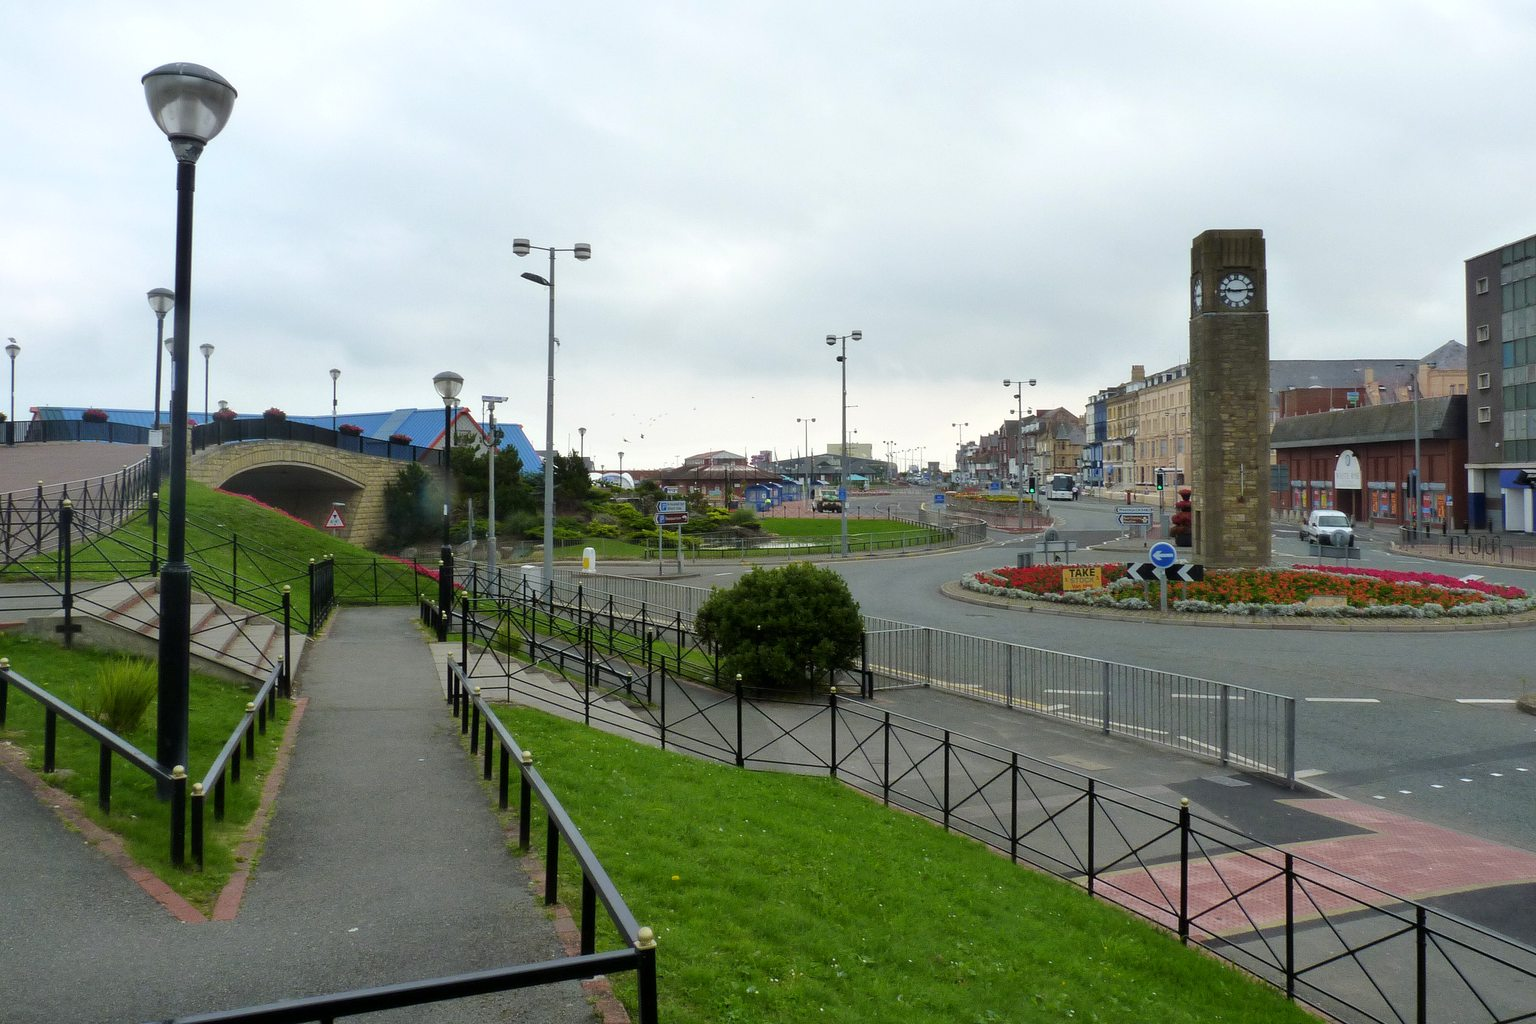 rhyl east parade clock tower.jpg